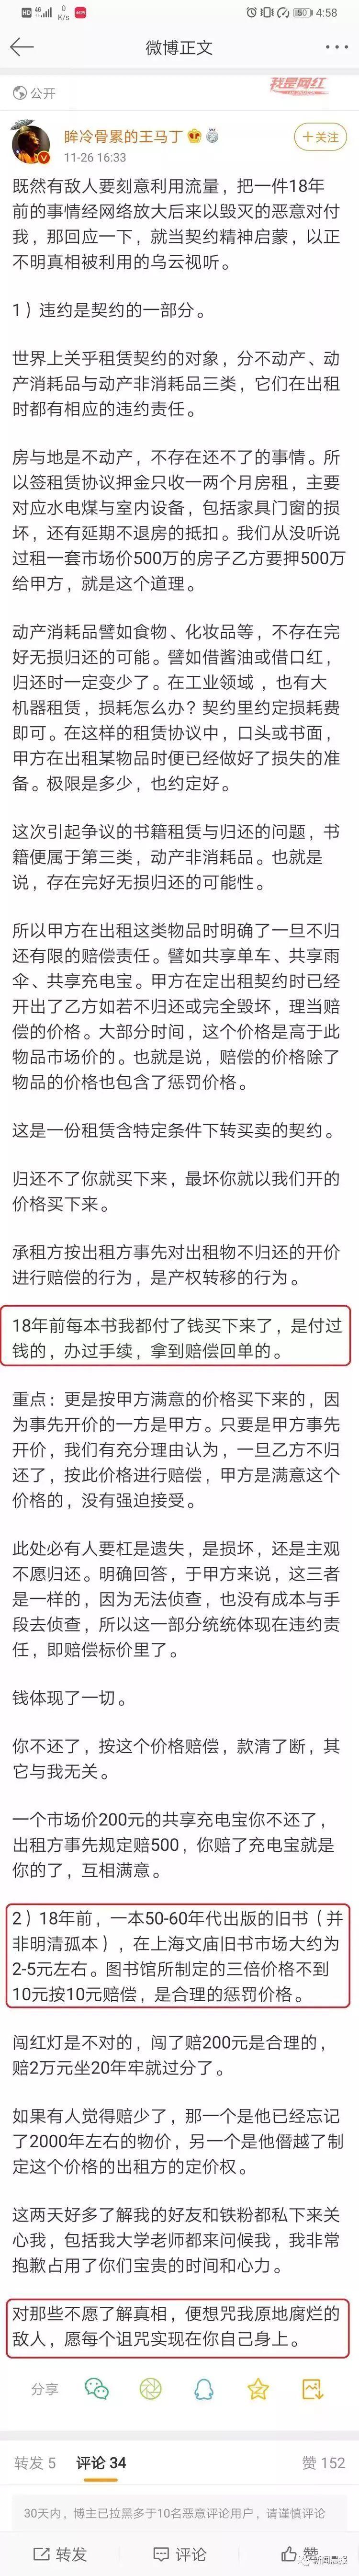 www52h路cn·北京地铁7号线东延全线贯通 预计年底建成通车